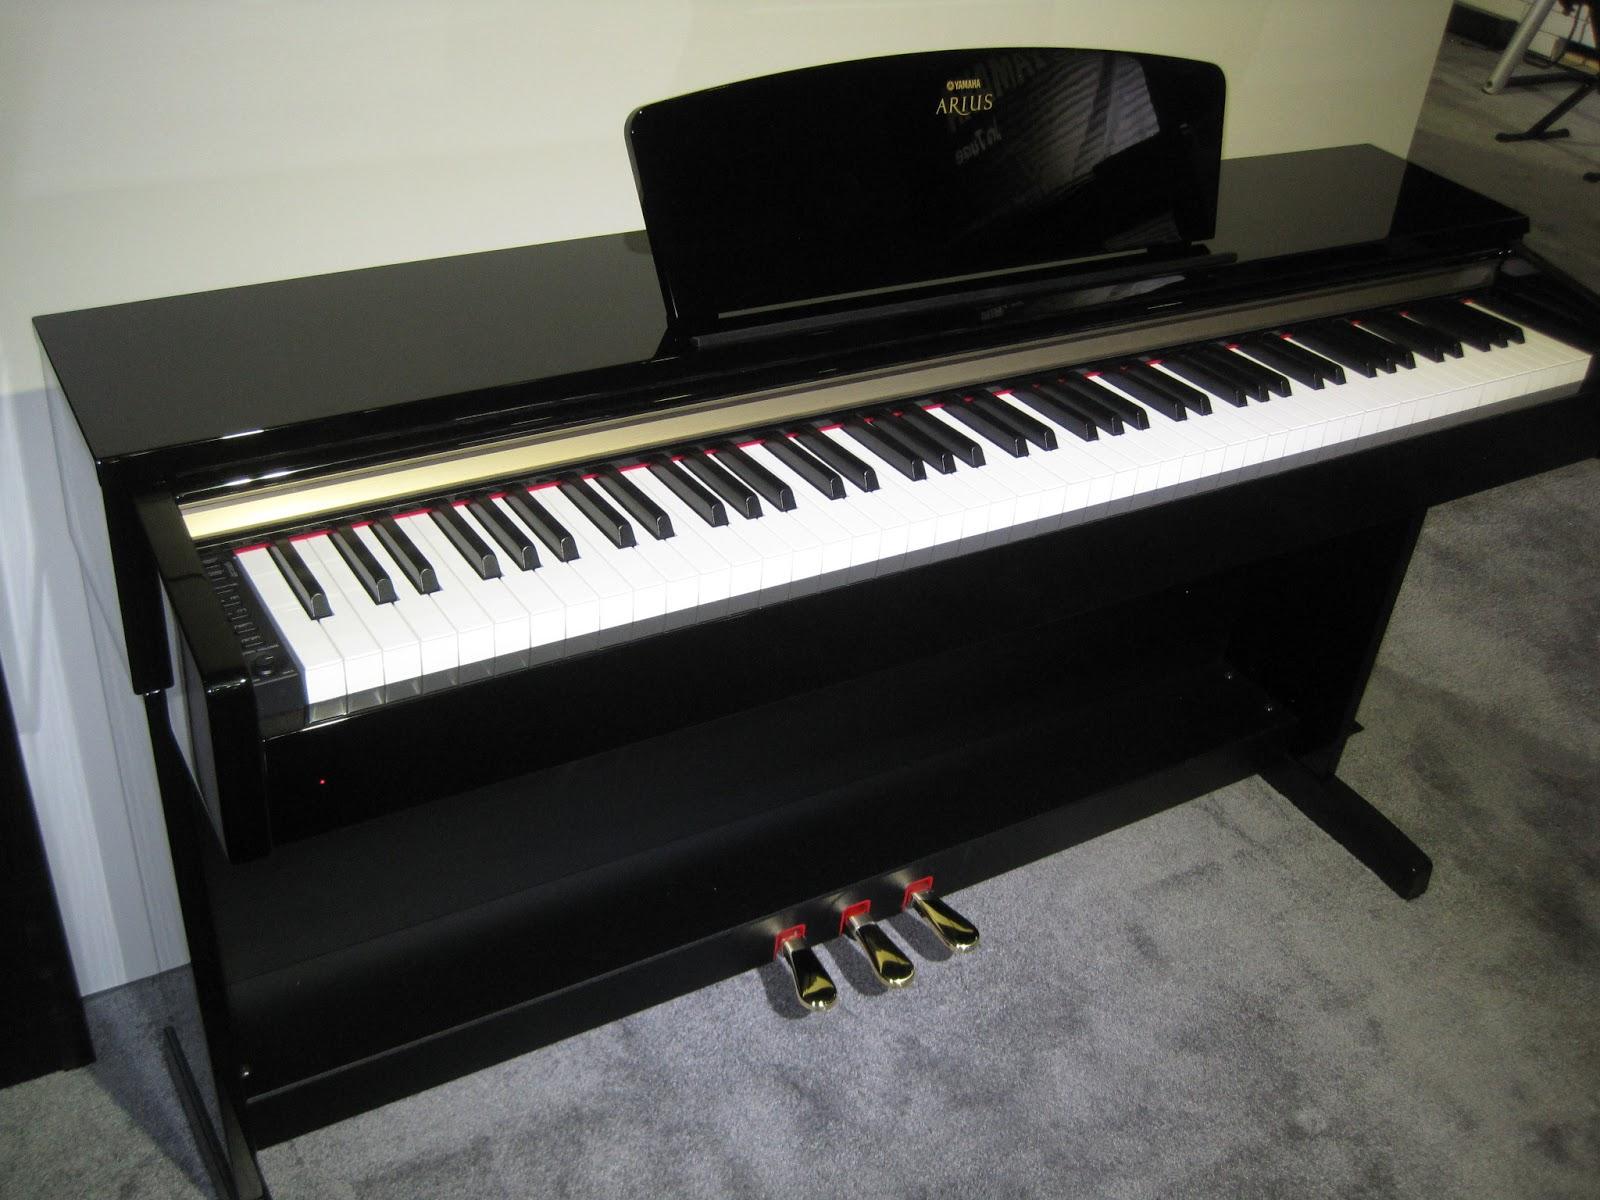 azpianonews review digital pianos under 2000 for 2015 yamaha ydp181 yamaha ydp162 yamaha. Black Bedroom Furniture Sets. Home Design Ideas